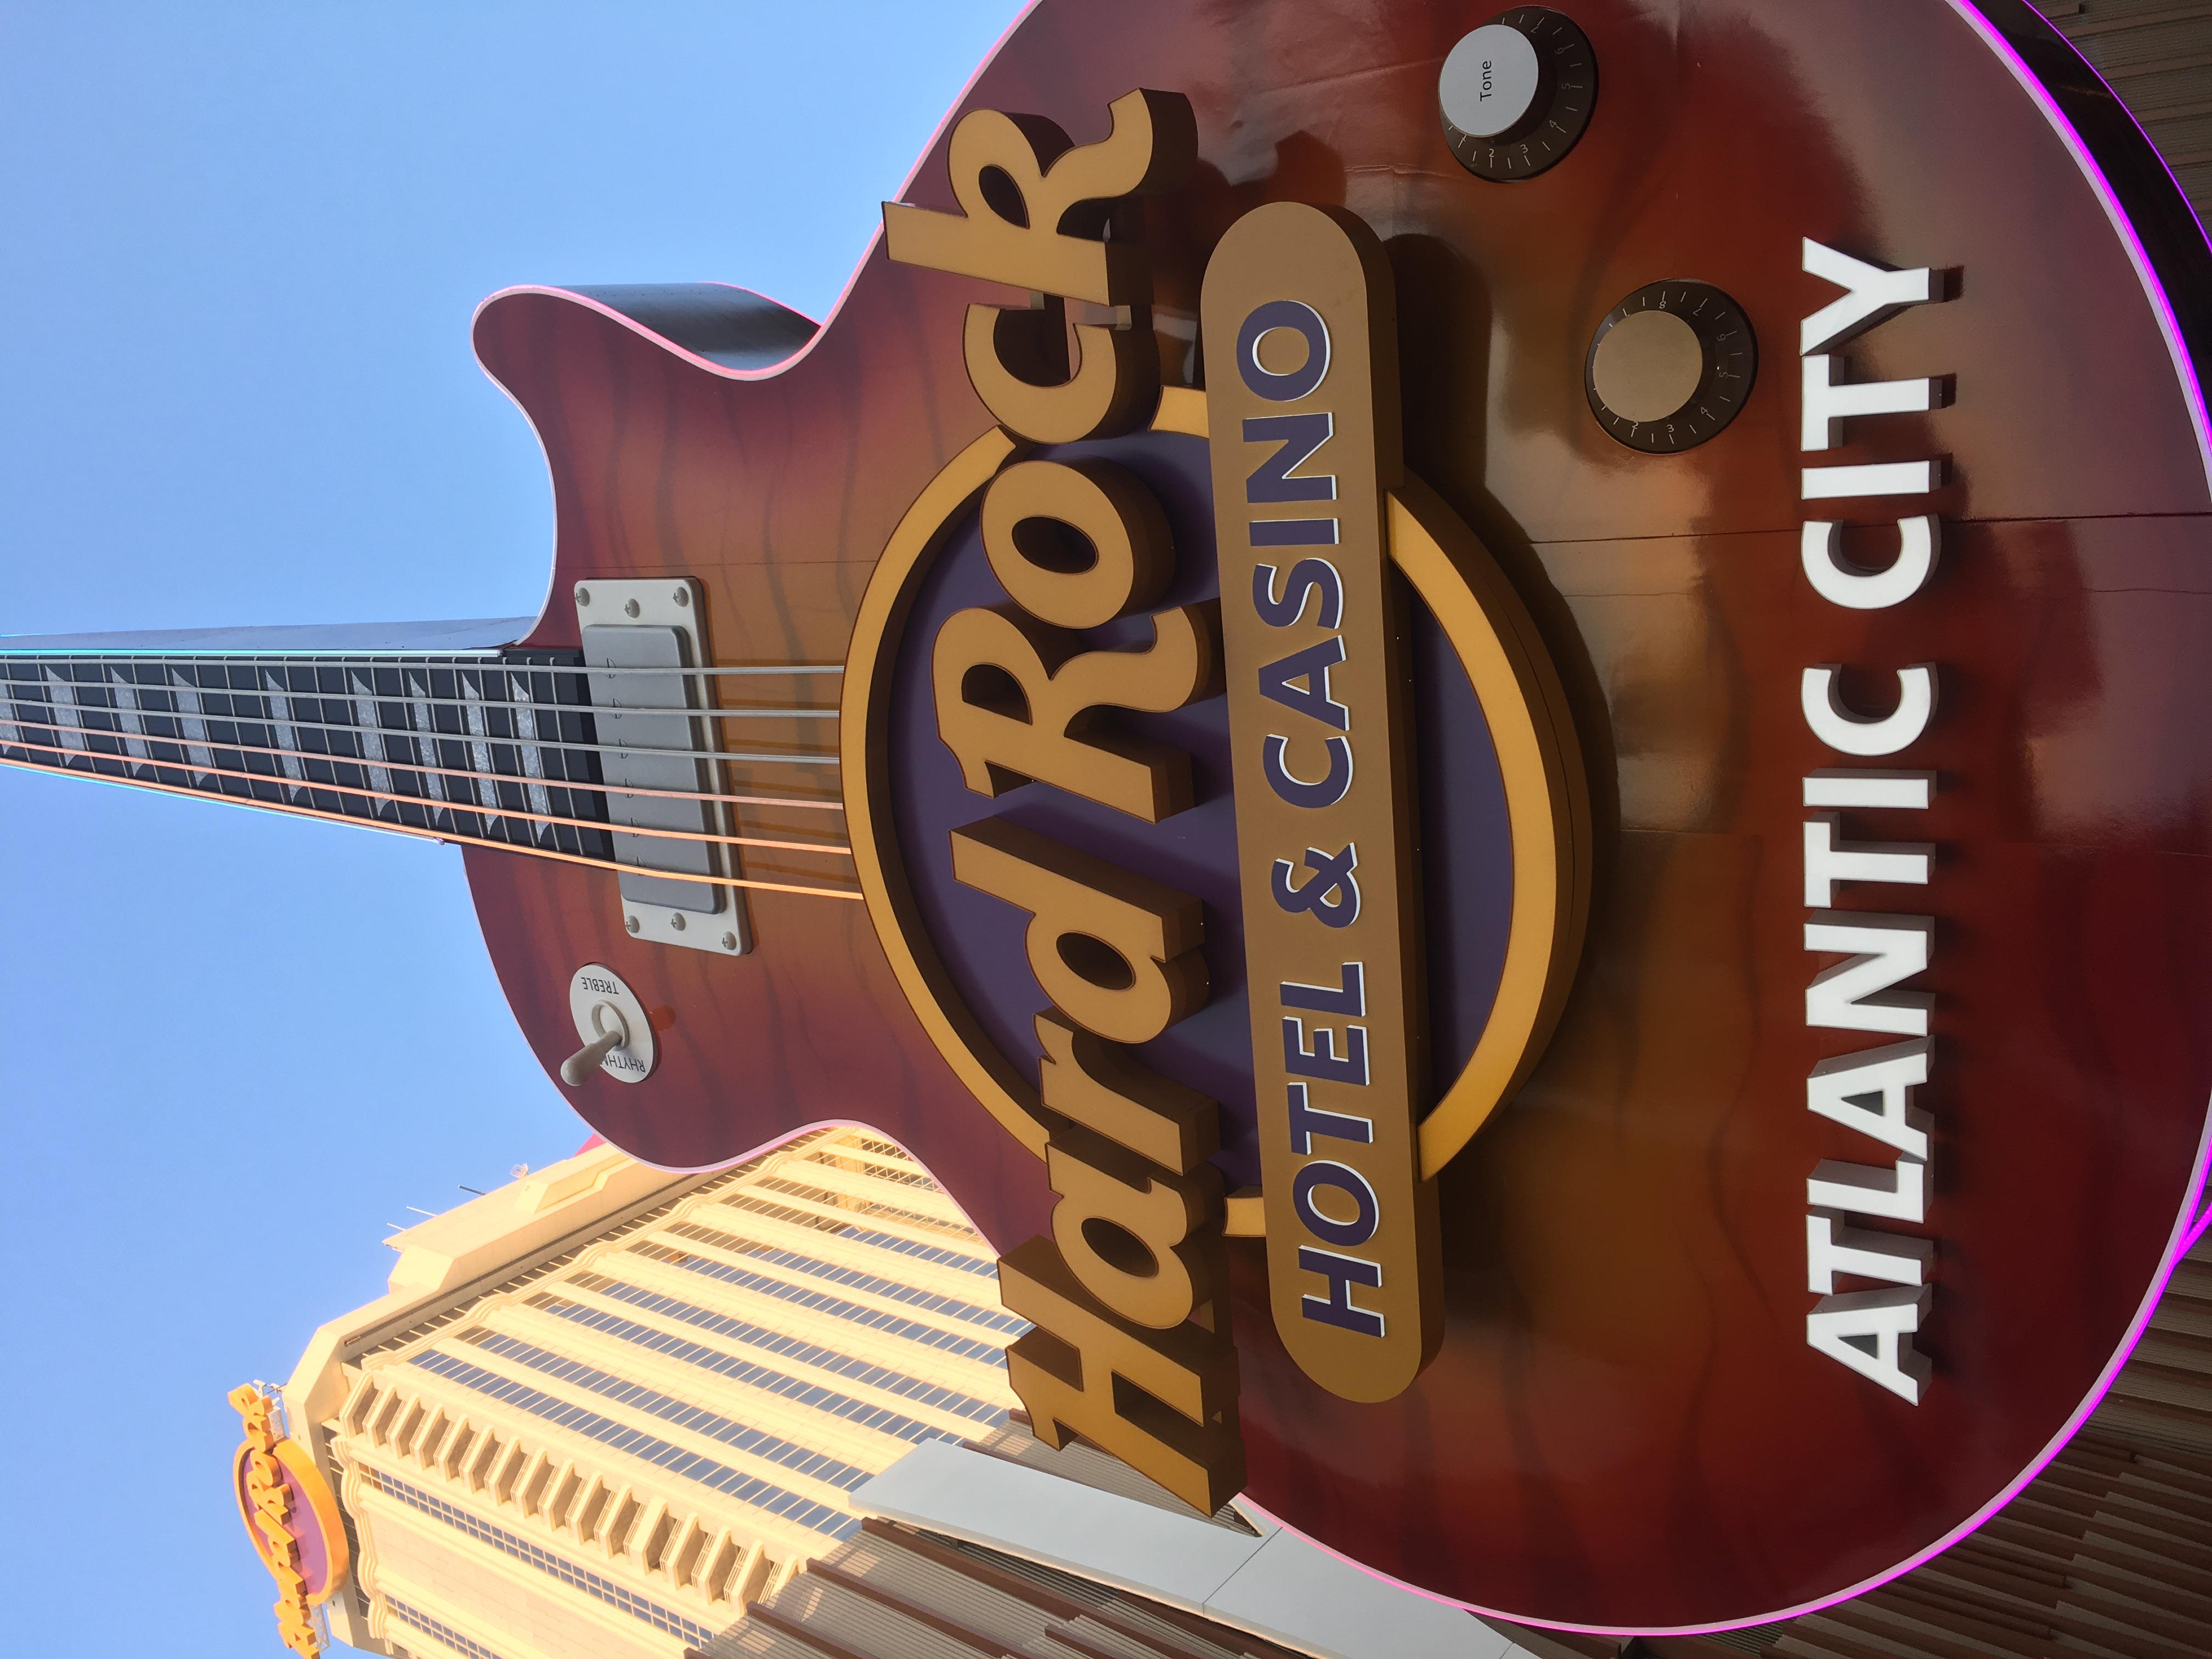 Hard Rock Hotel & Casino Atlantic City - Wikipedia